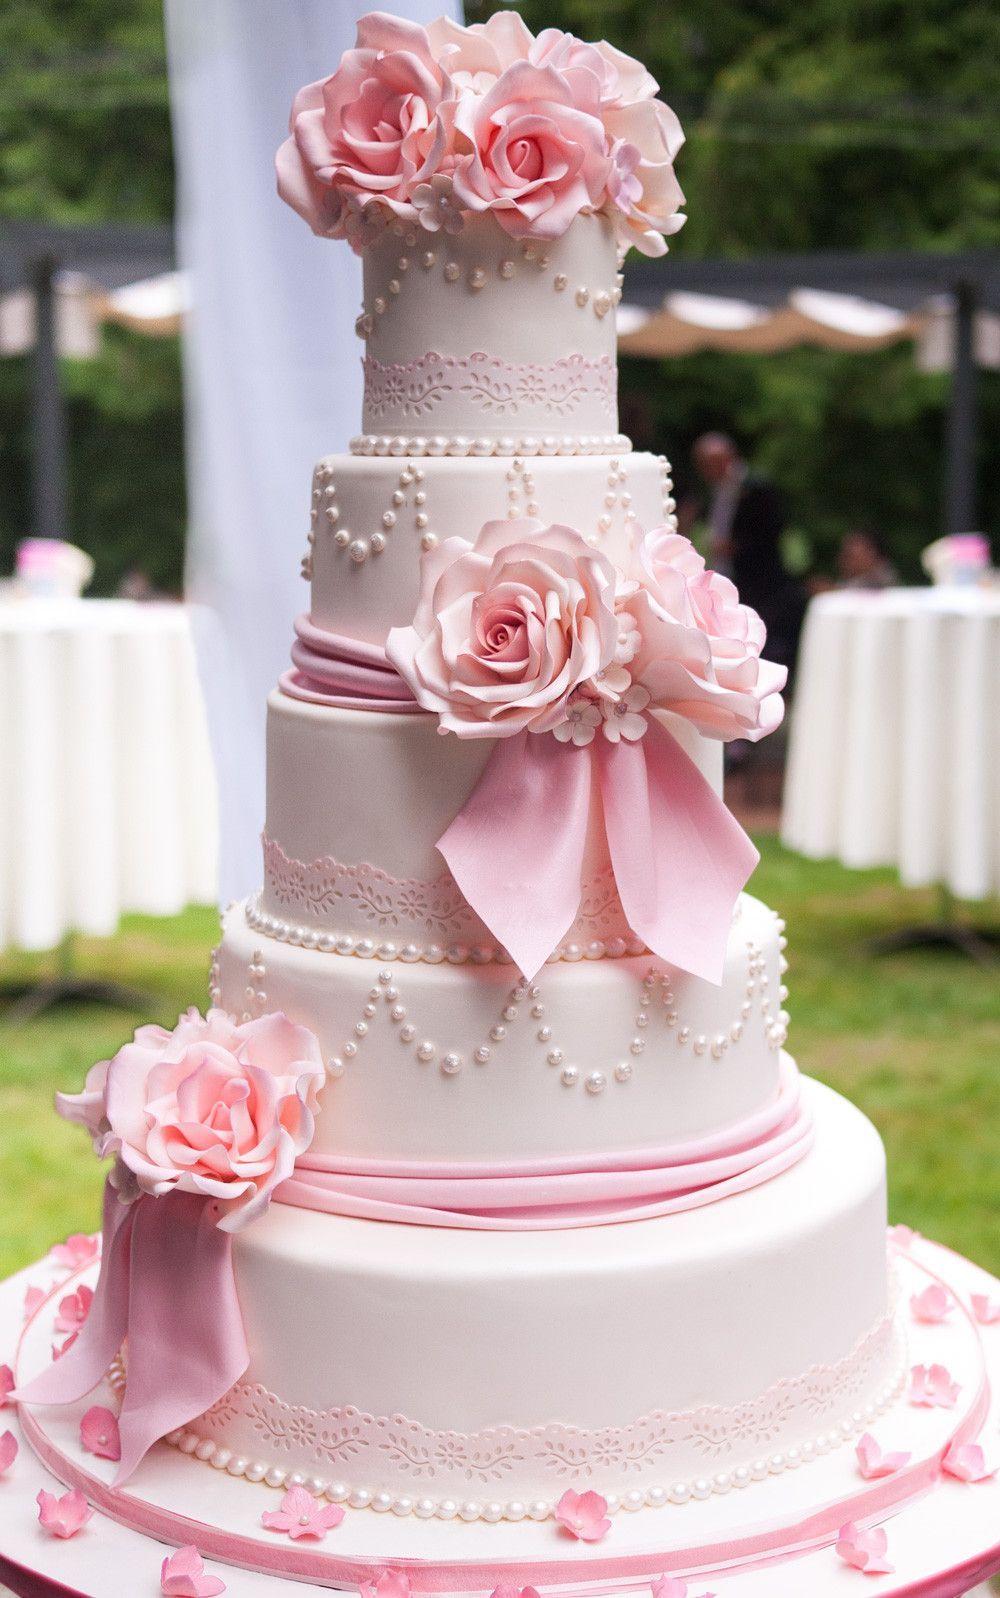 A wedding cake my stepmum made for a friend. I spent the most tense ...